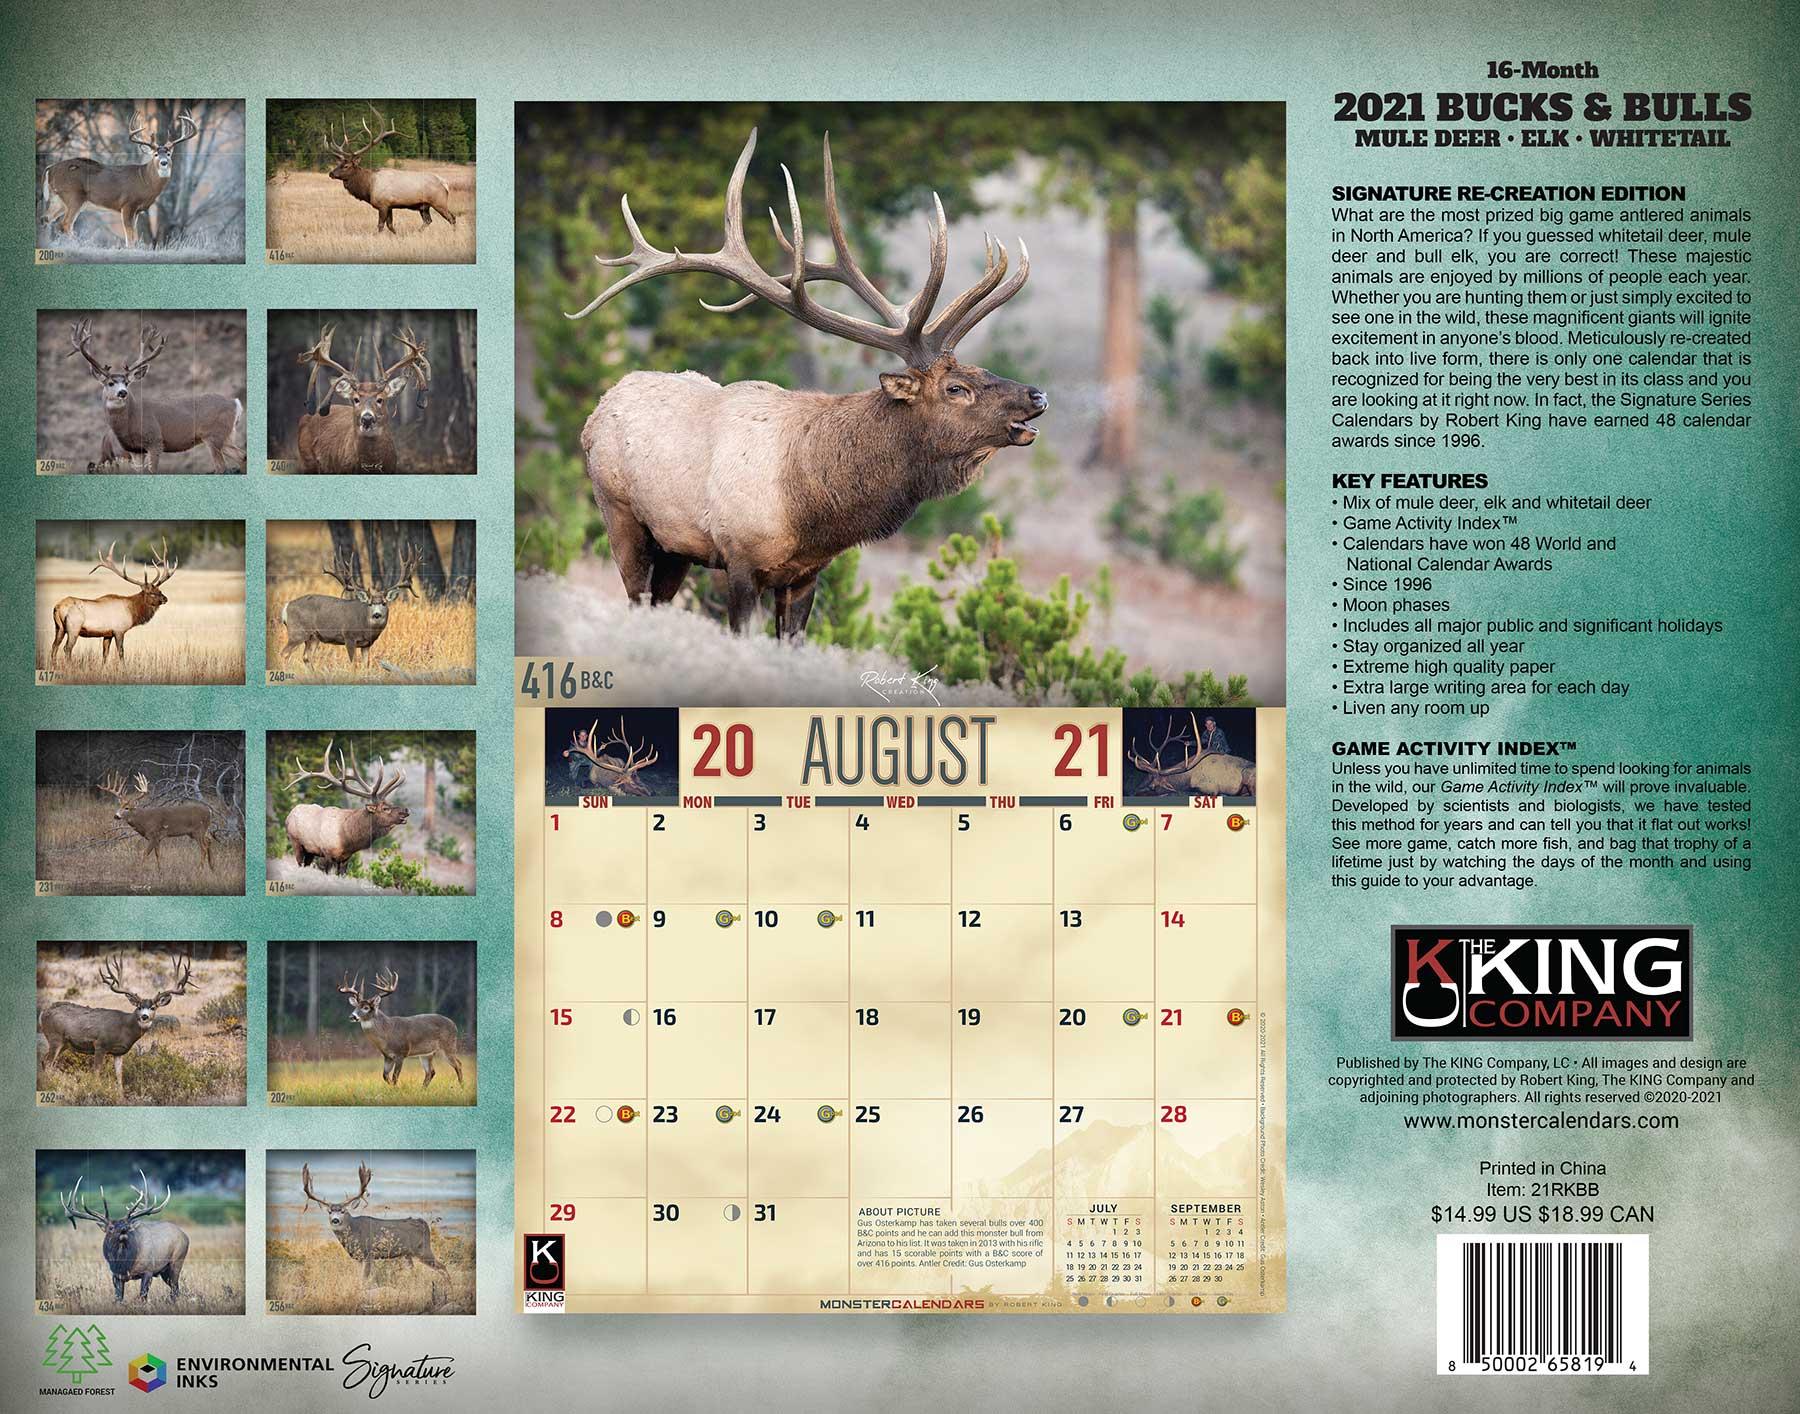 2021 Bucks & Bulls Calendar, 2021 Whitetail Deer Mule Deer